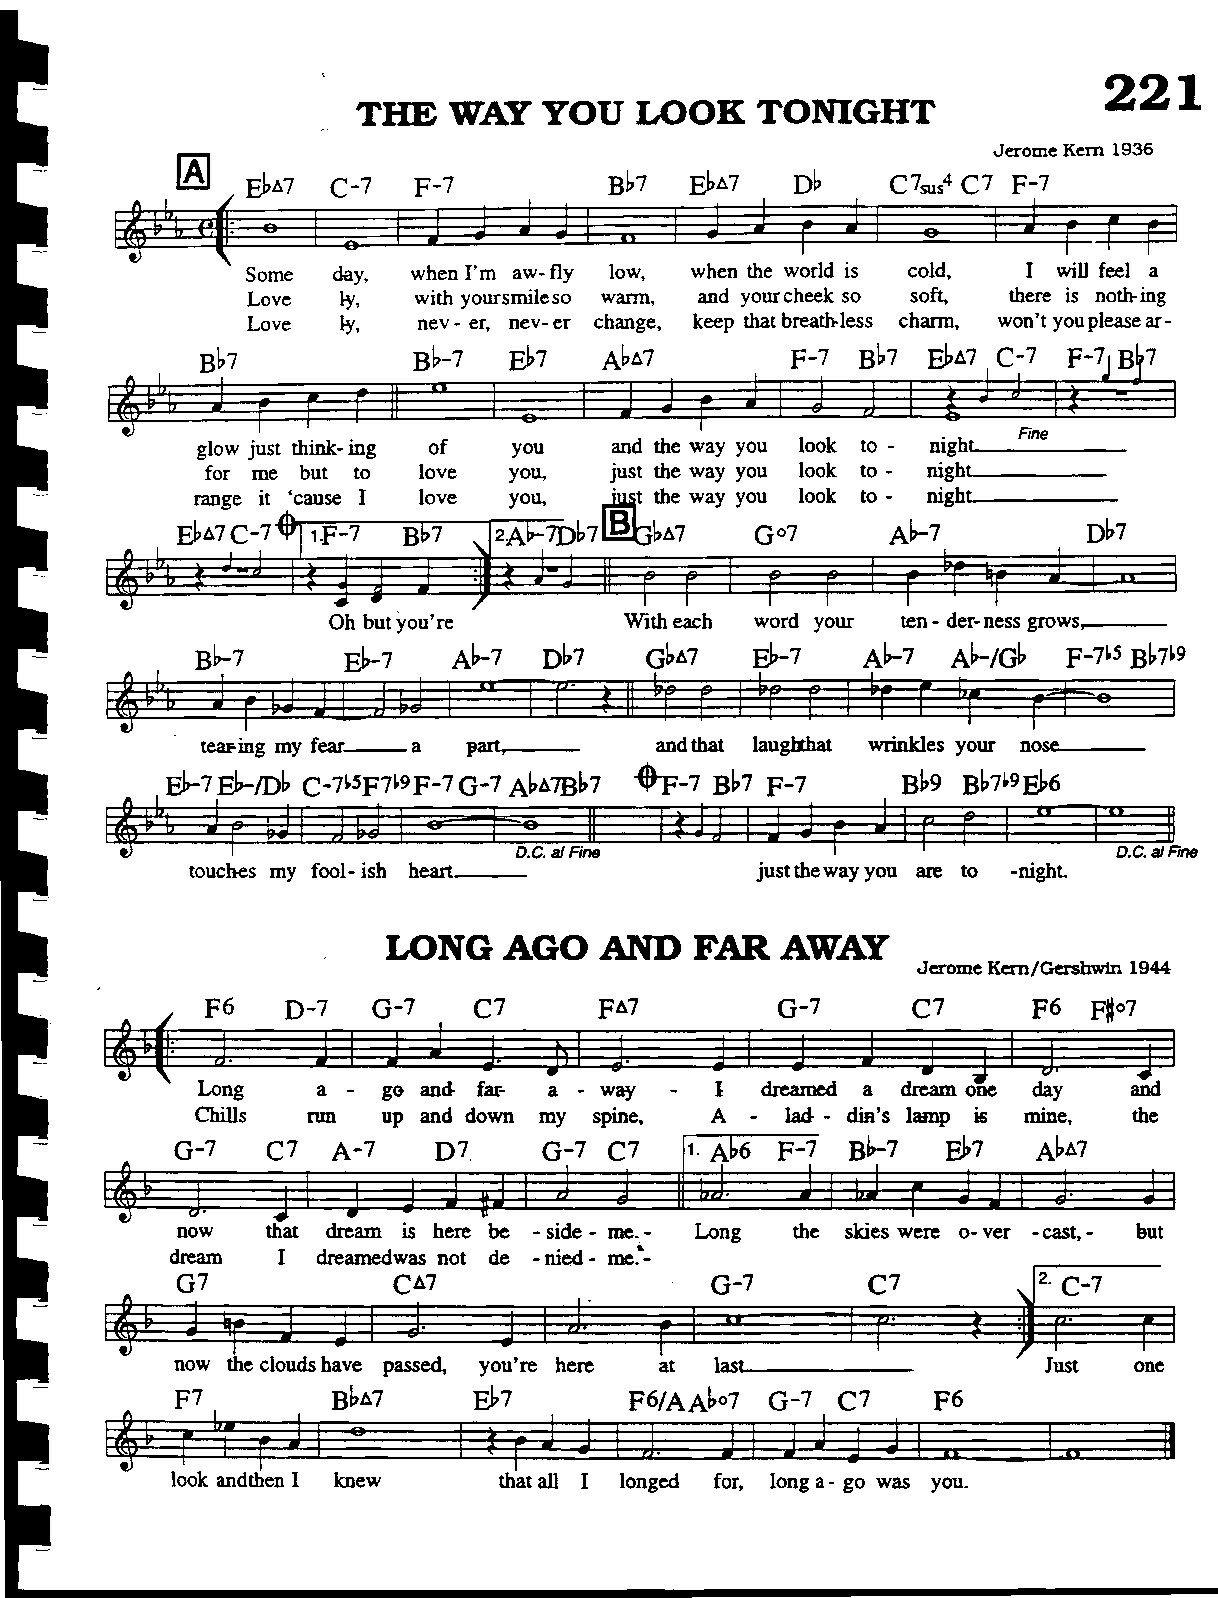 Pin By Mary Faith Suarez On Music Music Music Saxophone Sheet Music Jazz Songs Trumpet Sheet Music